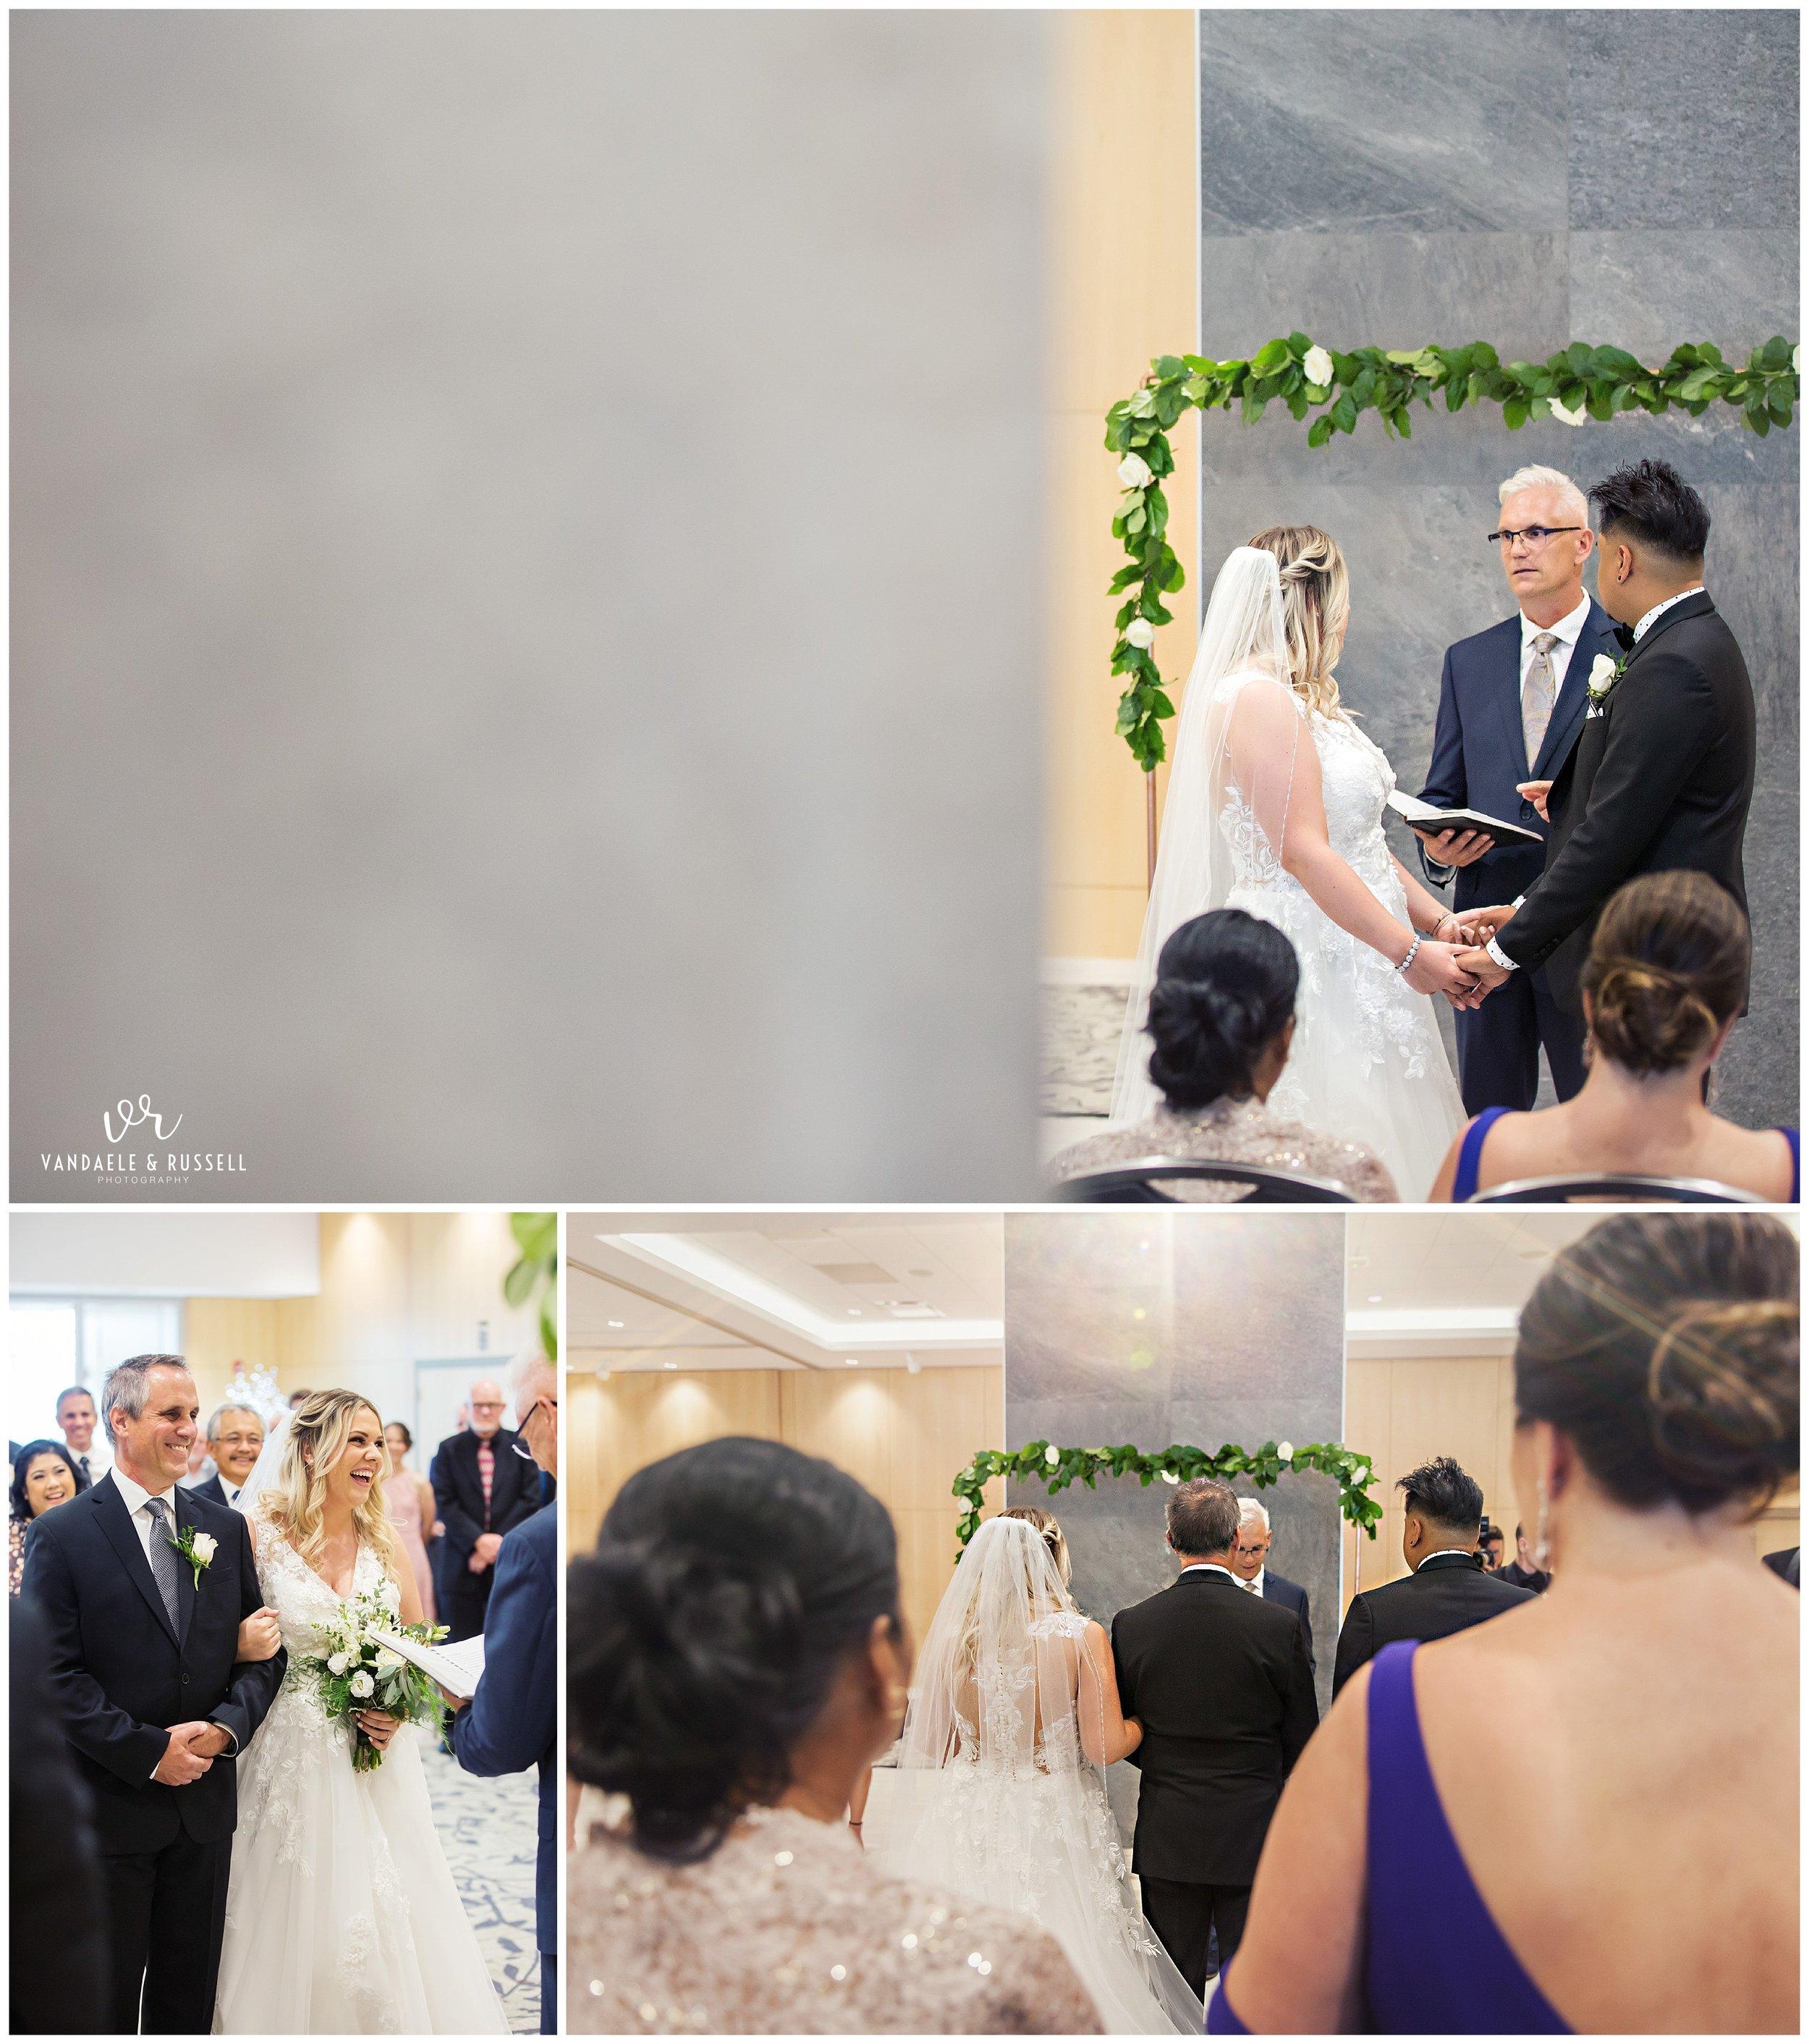 VanDaele-Russell-Wedding-Photography-London-Toronto-Ontario_0096.jpg